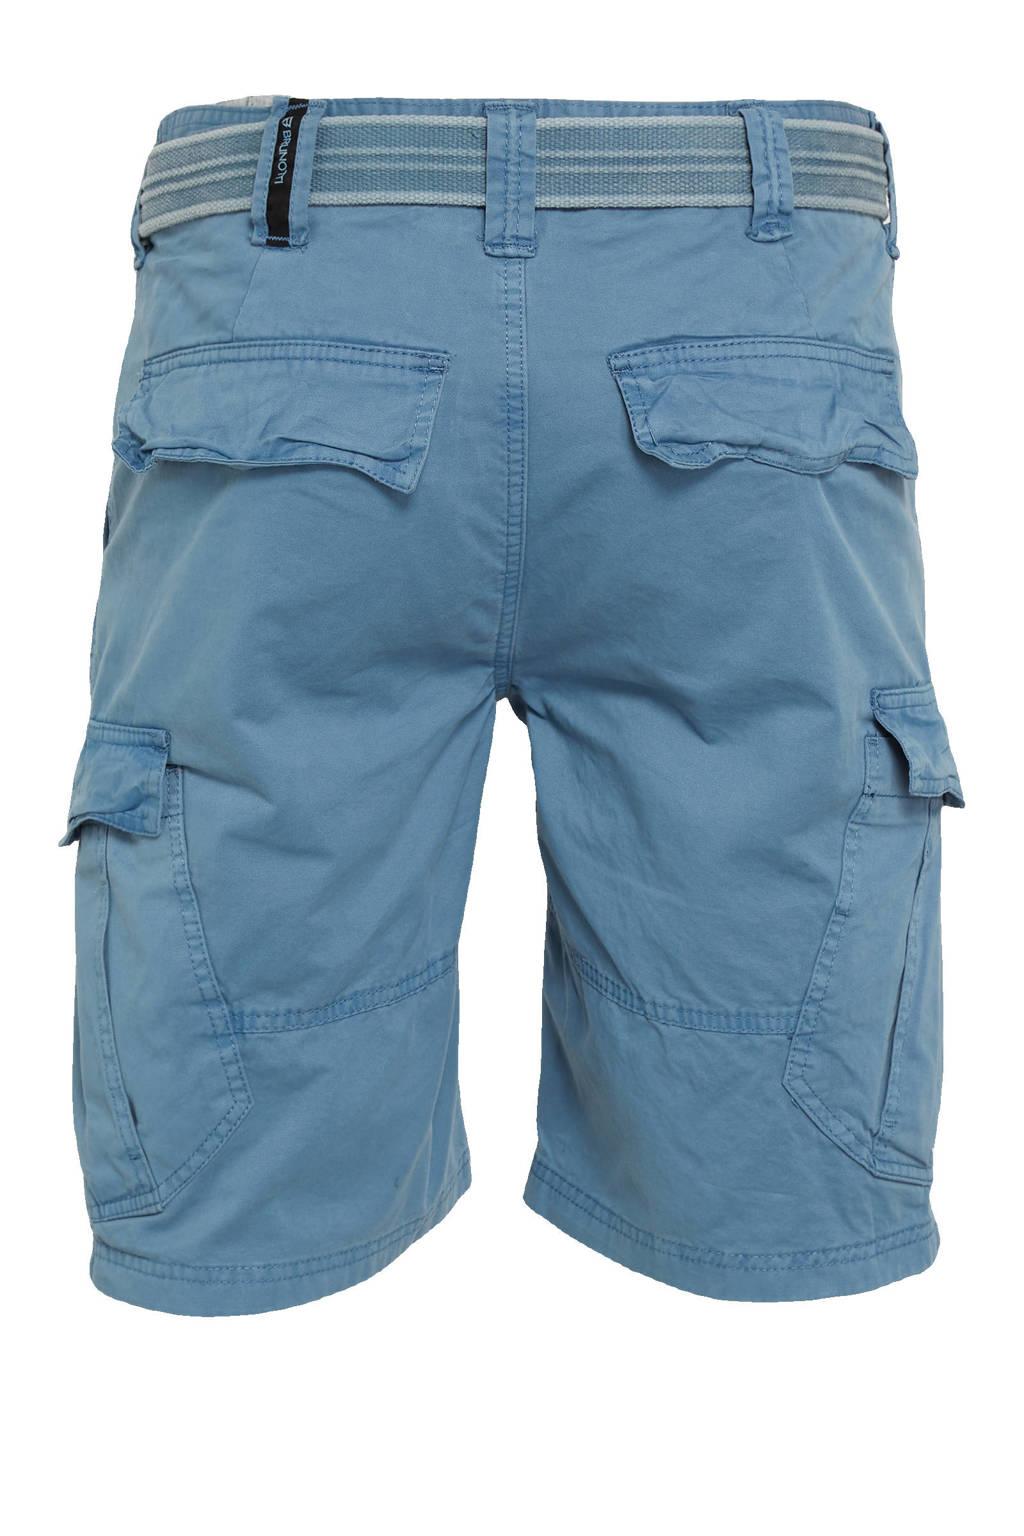 Brunotti outdoor short blauw, Blauw